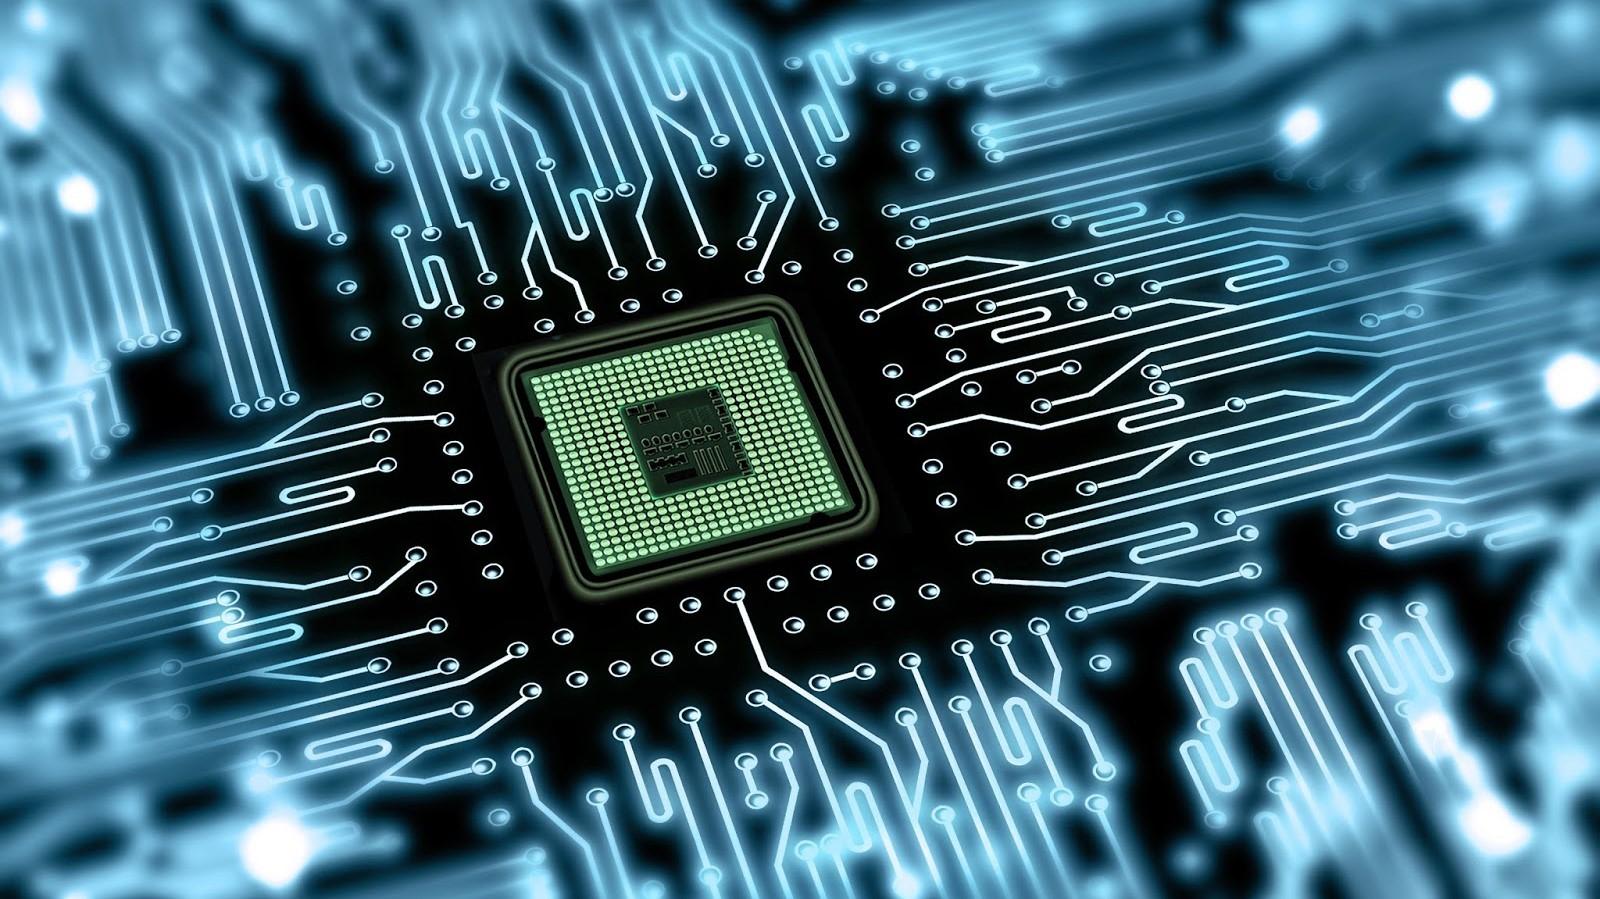 Китай шпионил за Apple и Amazon при помощи вредоносного чипа